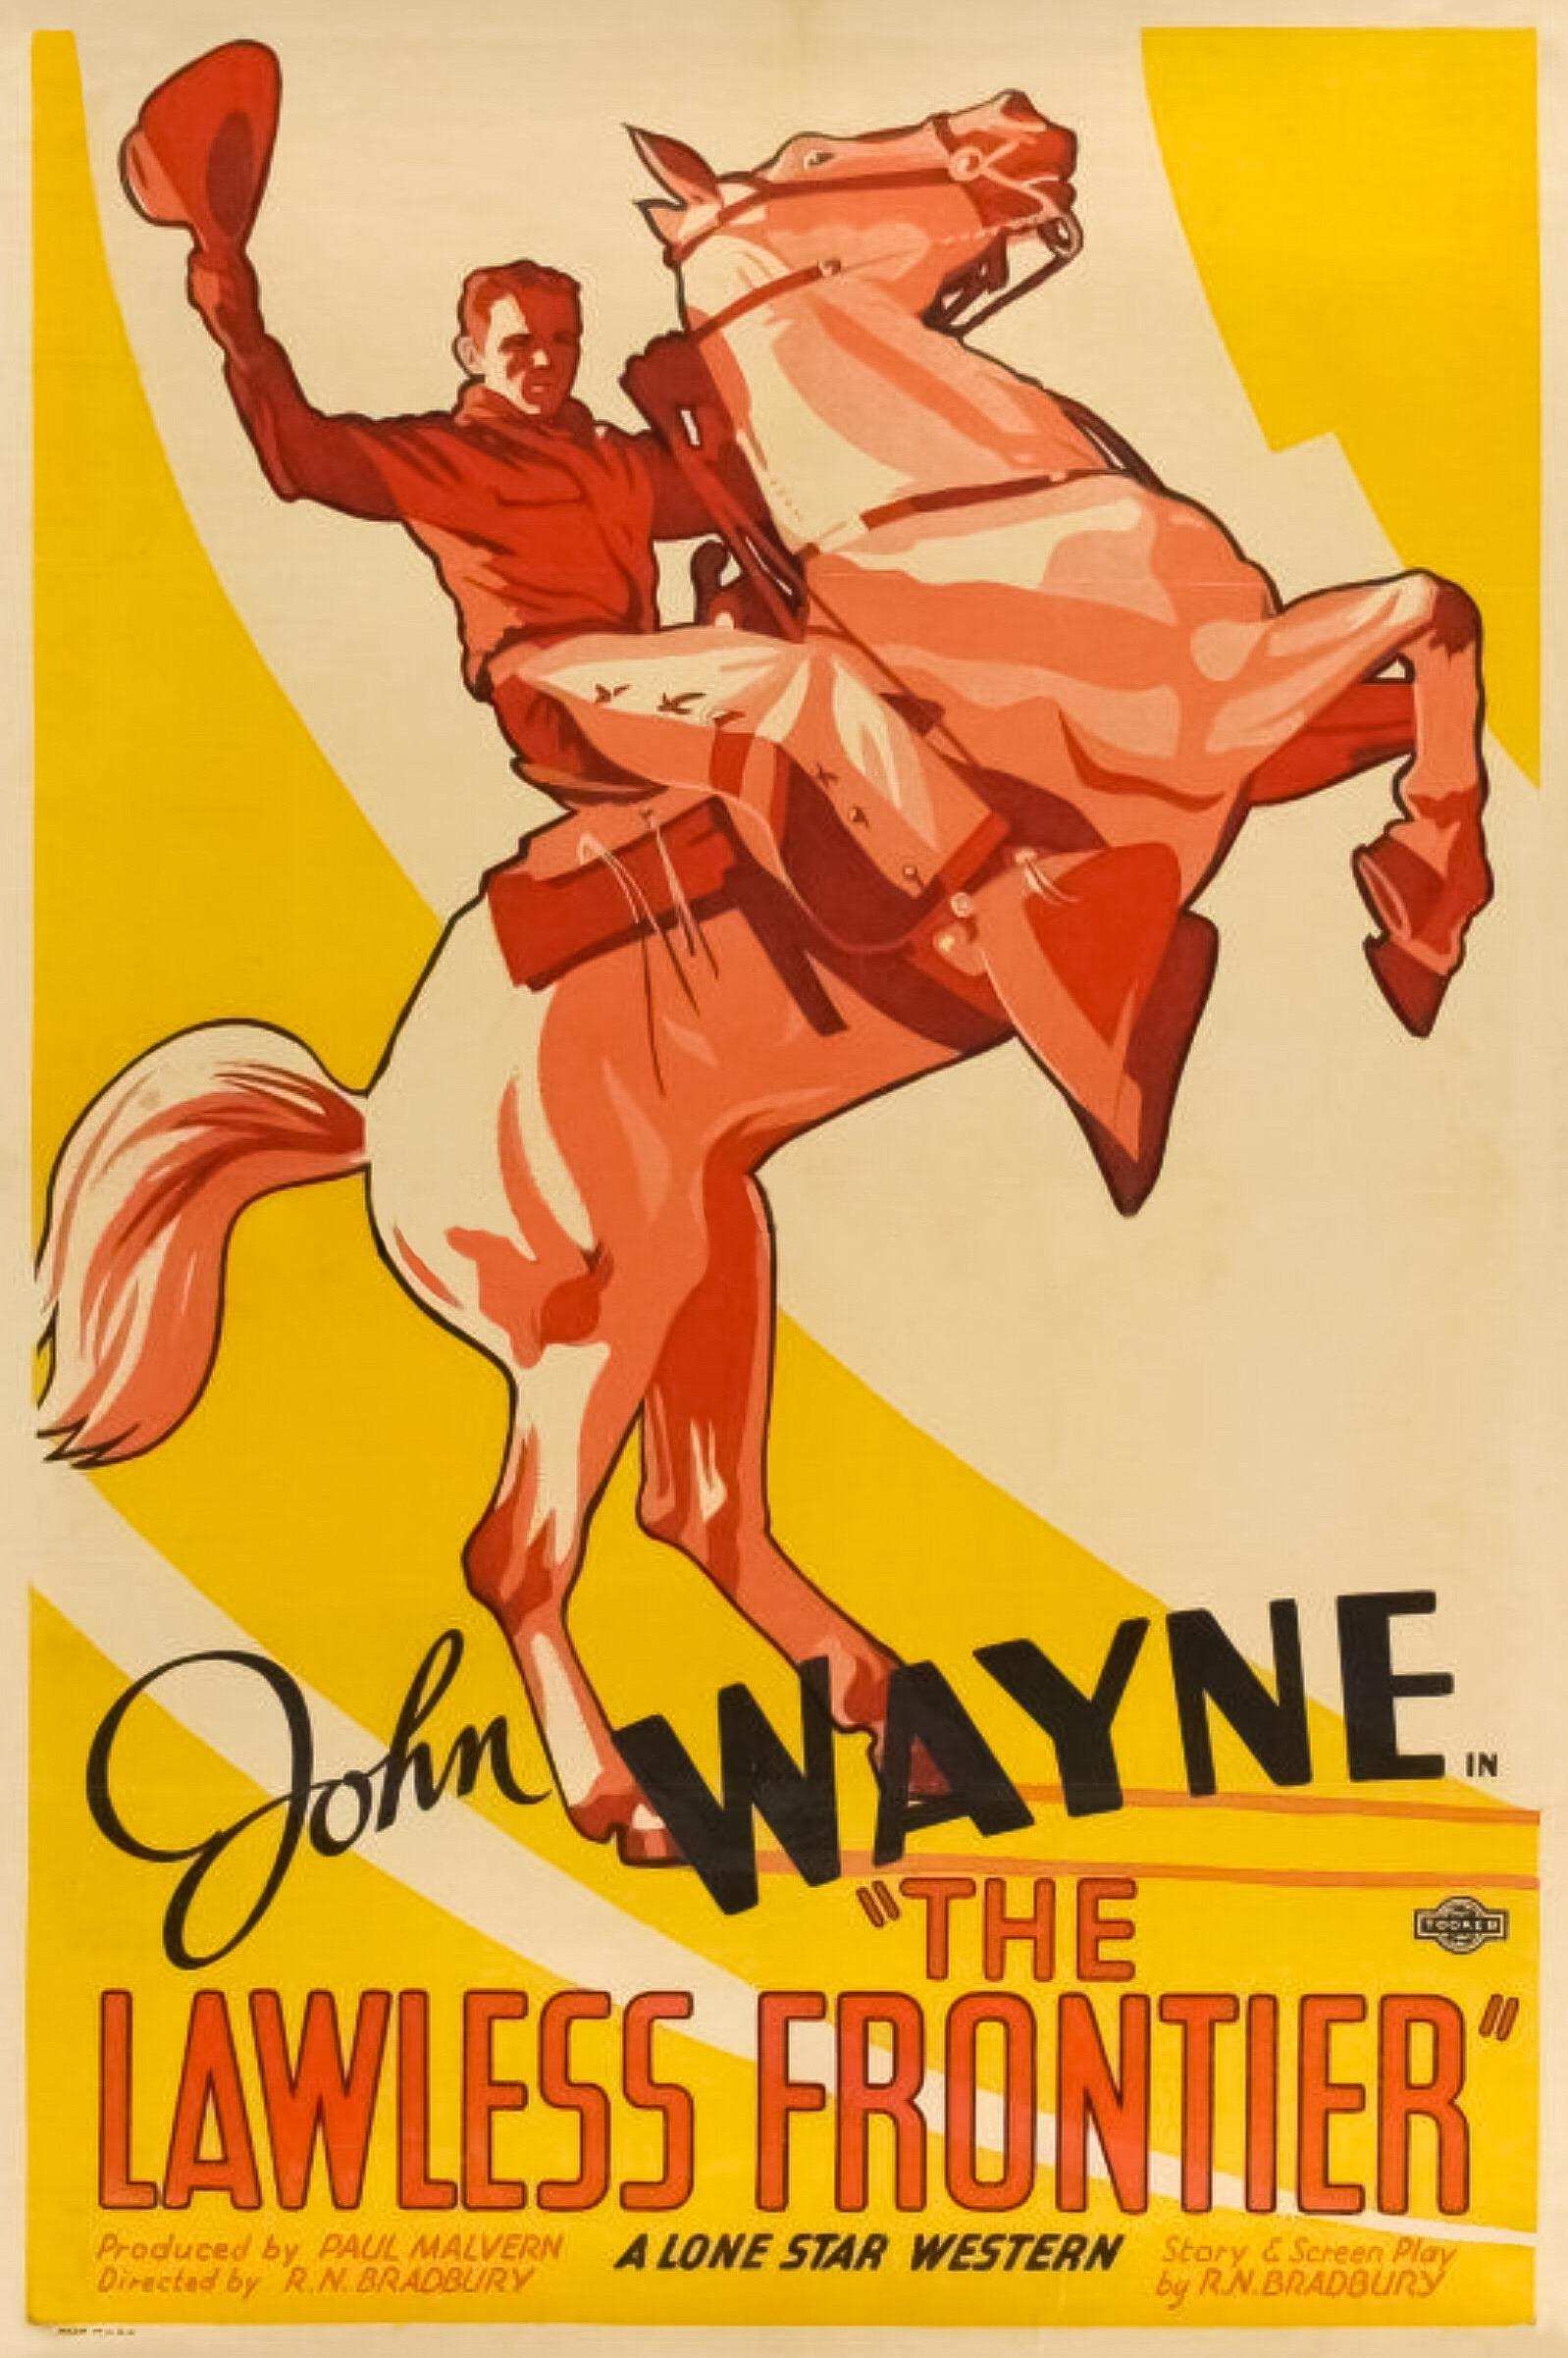 1935 Trail of Terror Bob Steele classic western movie poster print